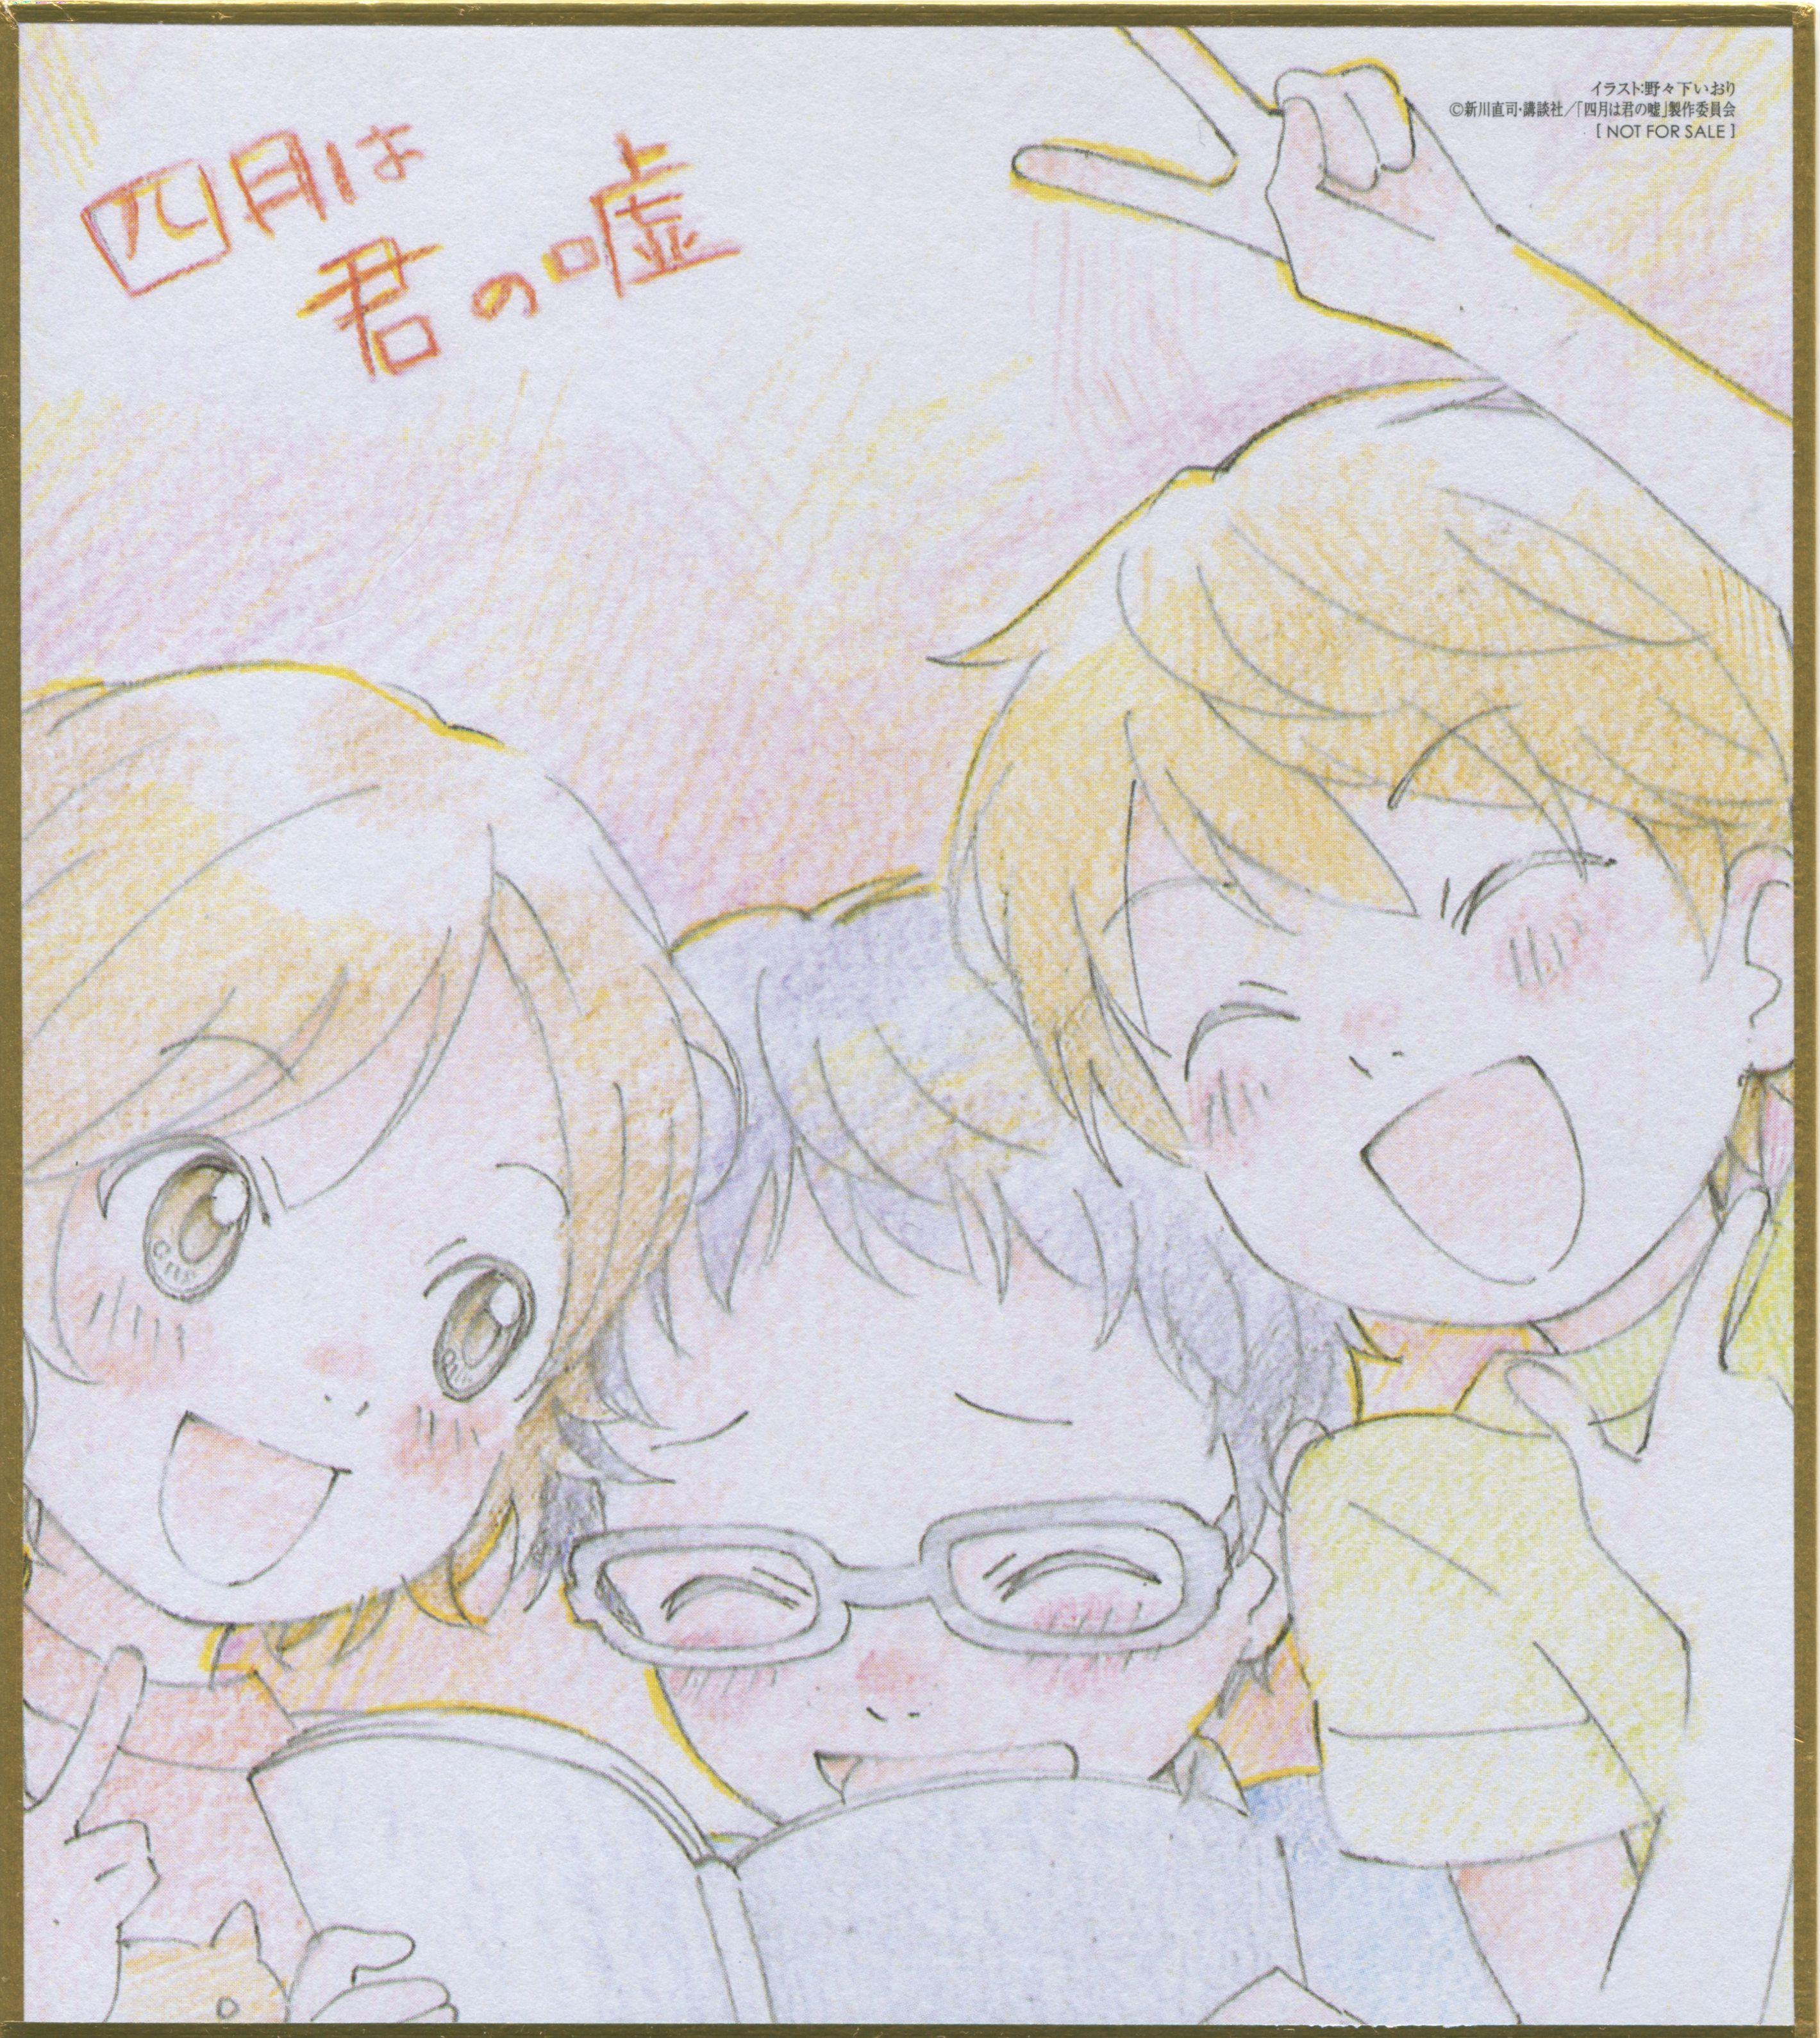 Sawabe Tsubaki, Arima Kousei & Watari Ryouta